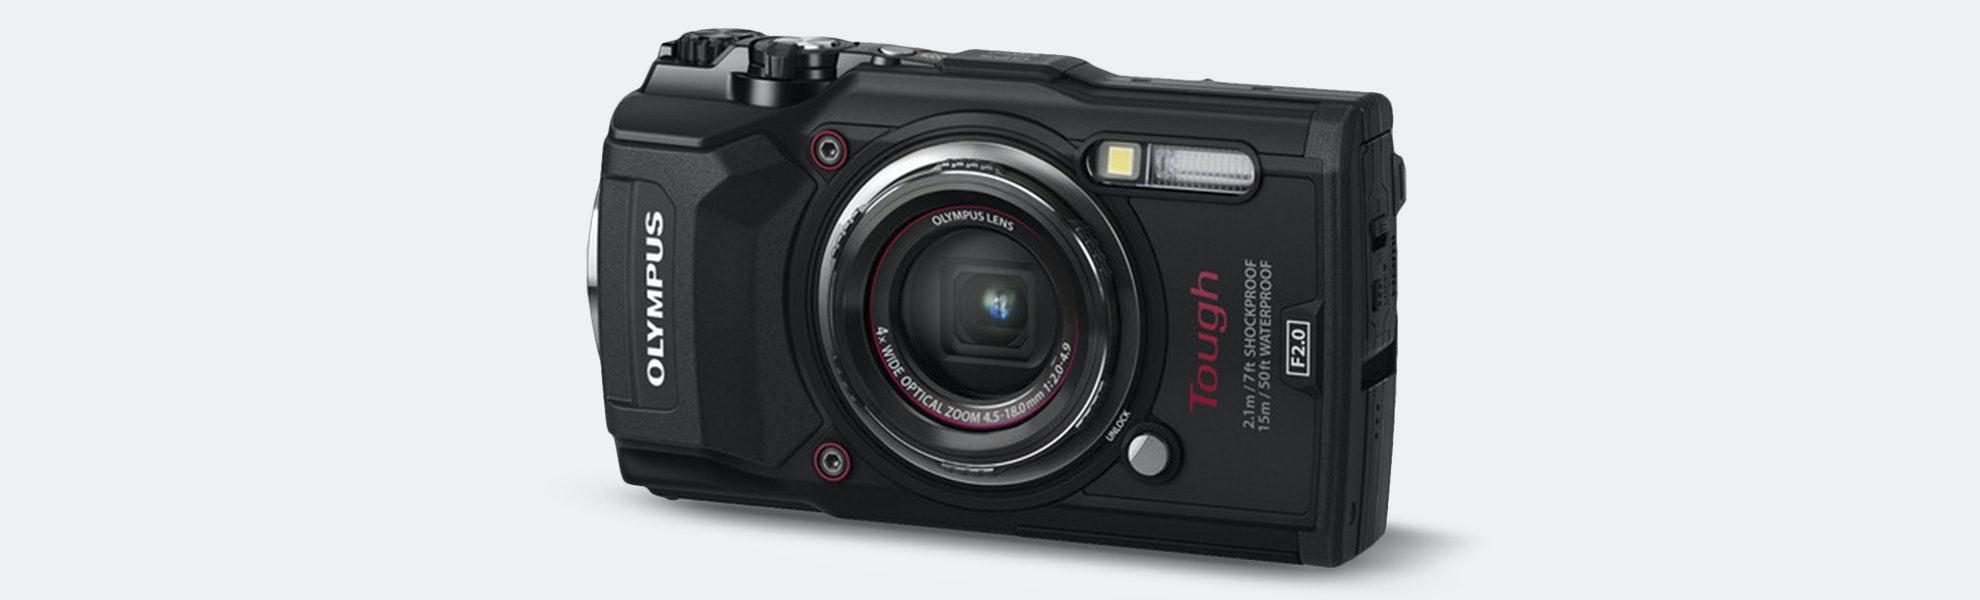 Olympus Tough TG-5 Digital Camera